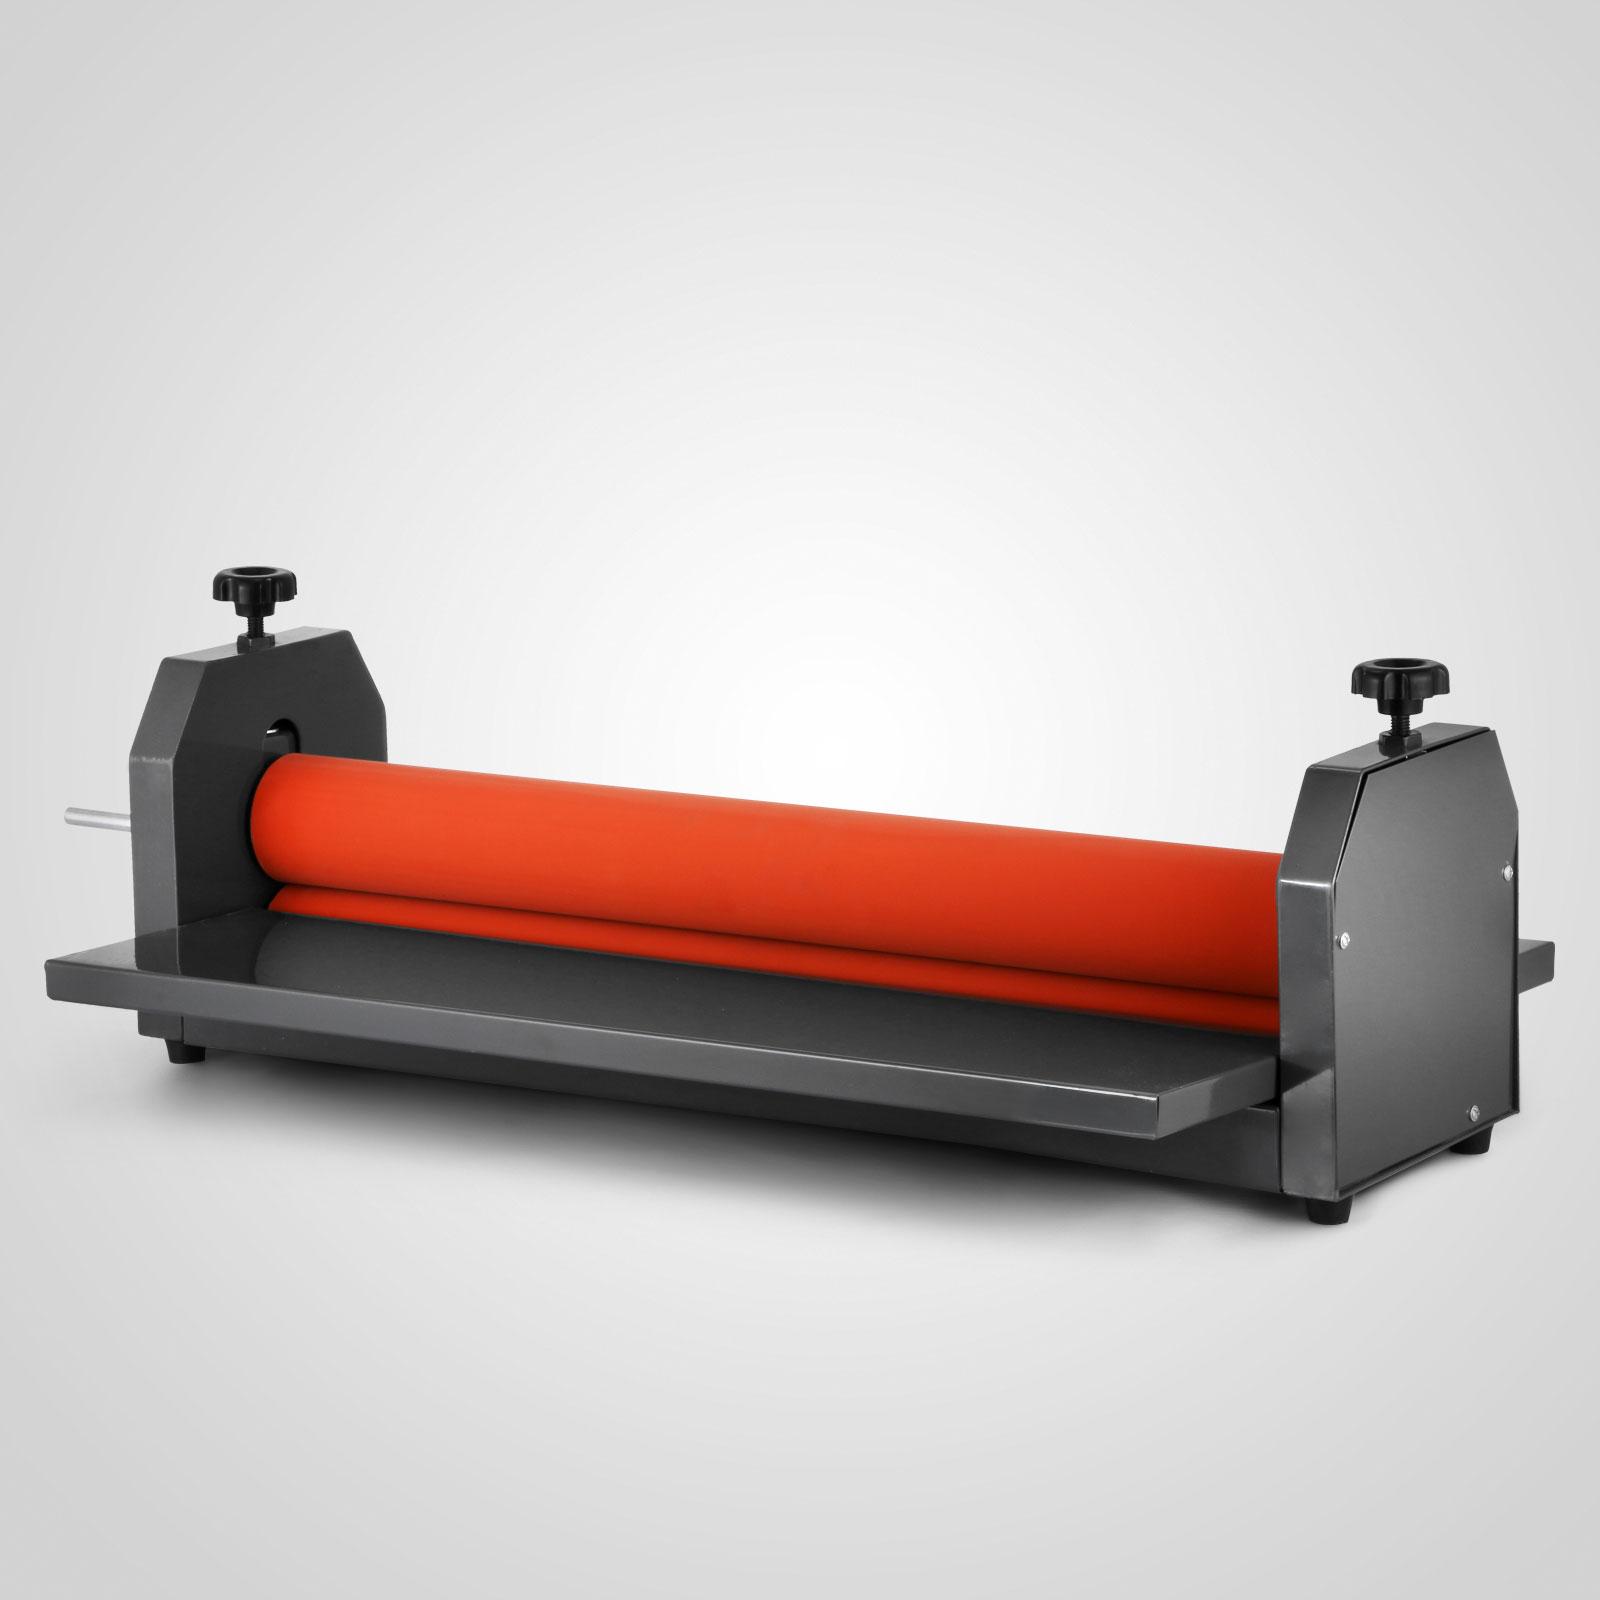 51in Cold Laminator Laminating Machine Manual Roll